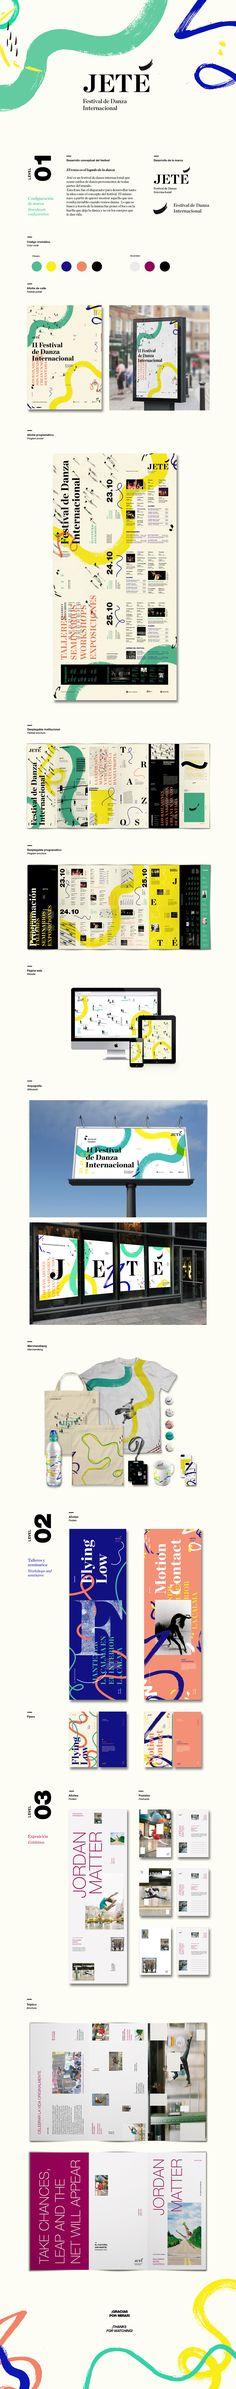 JETÉ International Dance Festival on Behance